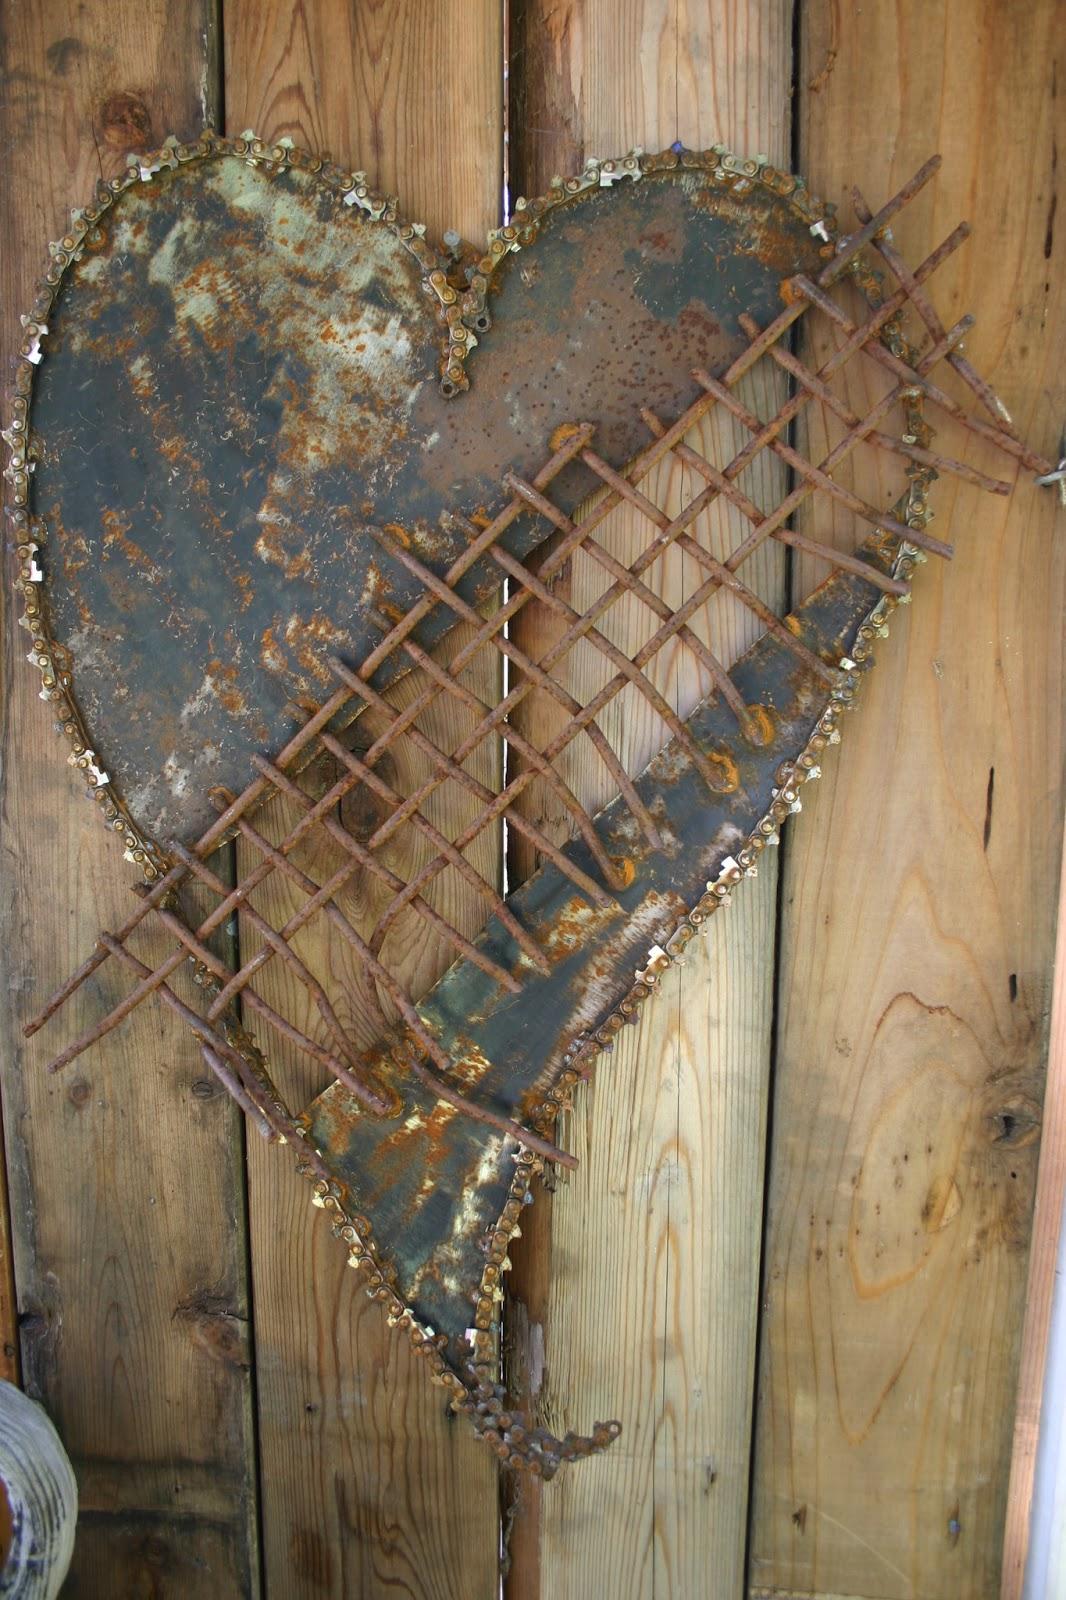 kathi 39 s garden art rust n stuff spring garden festival. Black Bedroom Furniture Sets. Home Design Ideas